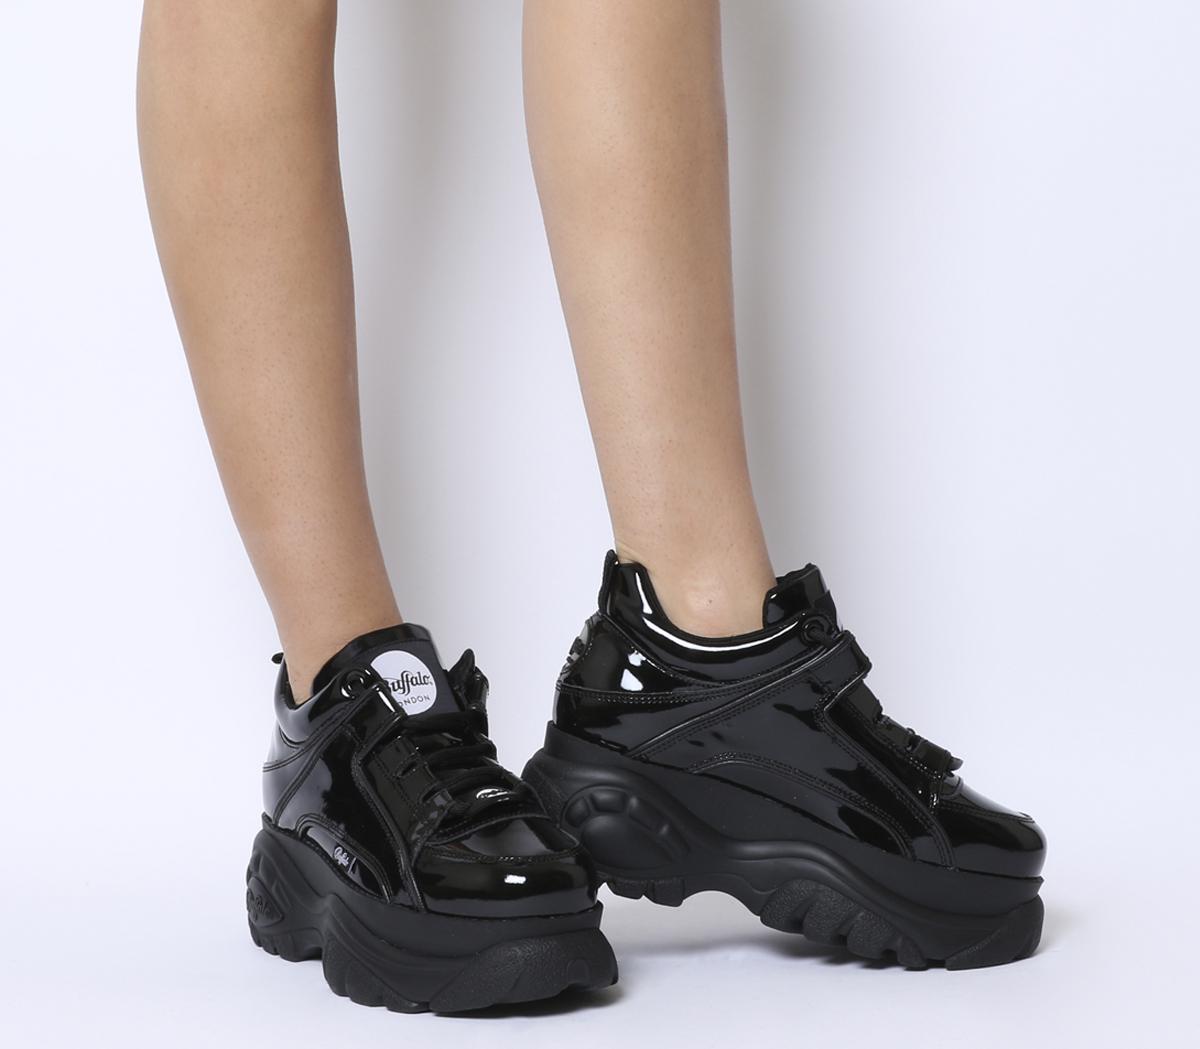 1339-14 2.0 Low Sneakers